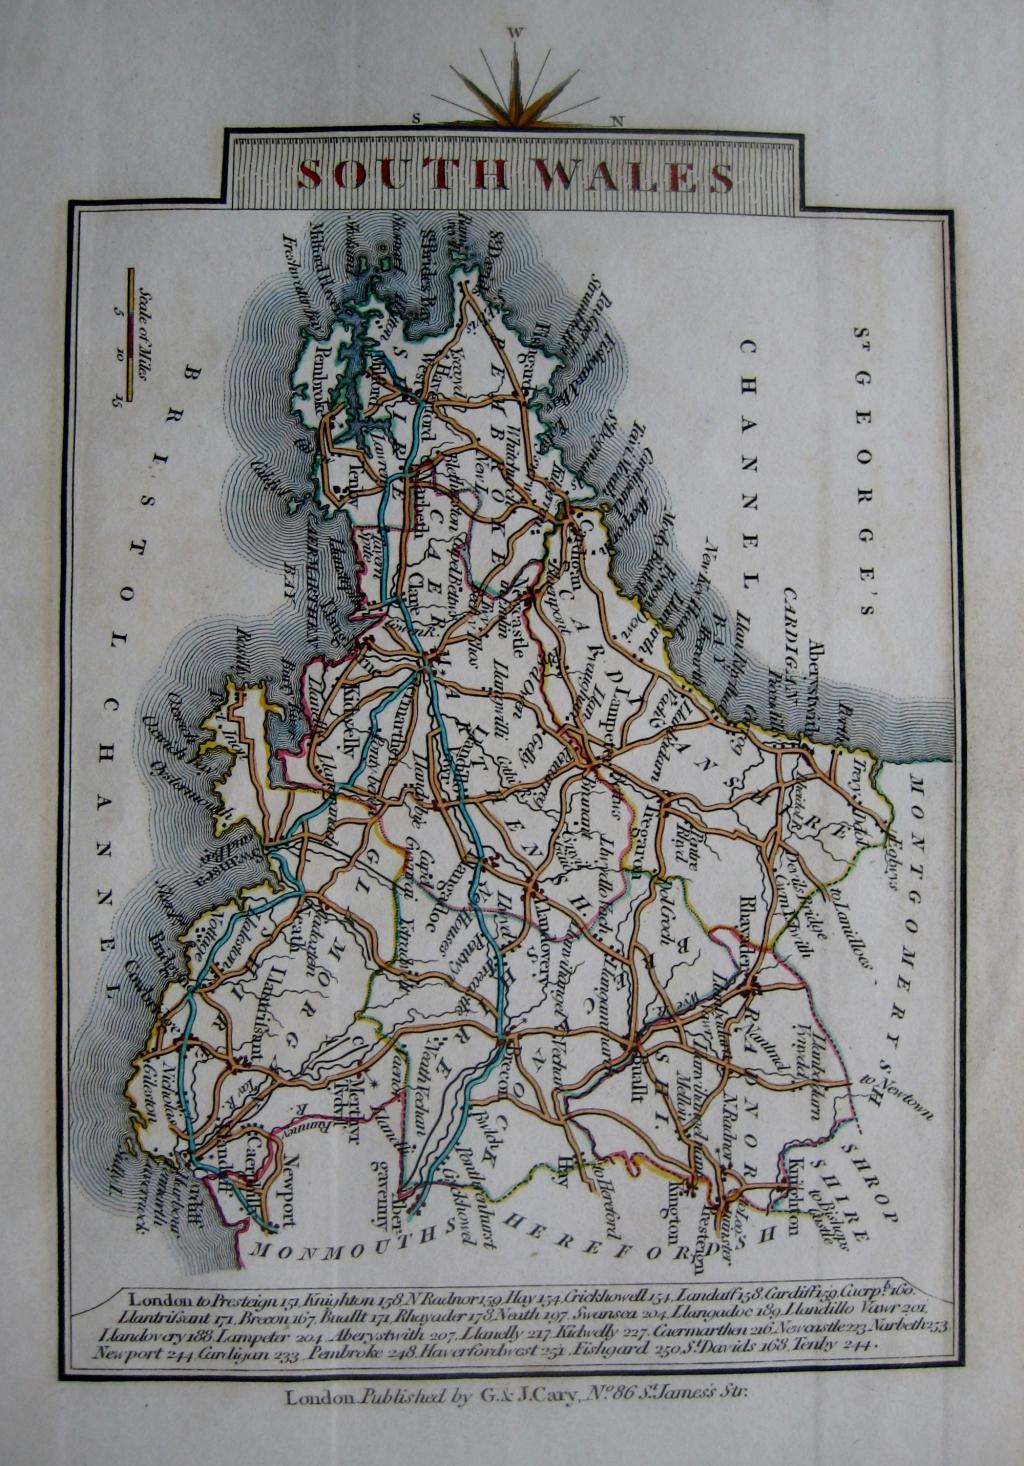 SOUTH WALES BY JOHN CARY C1828